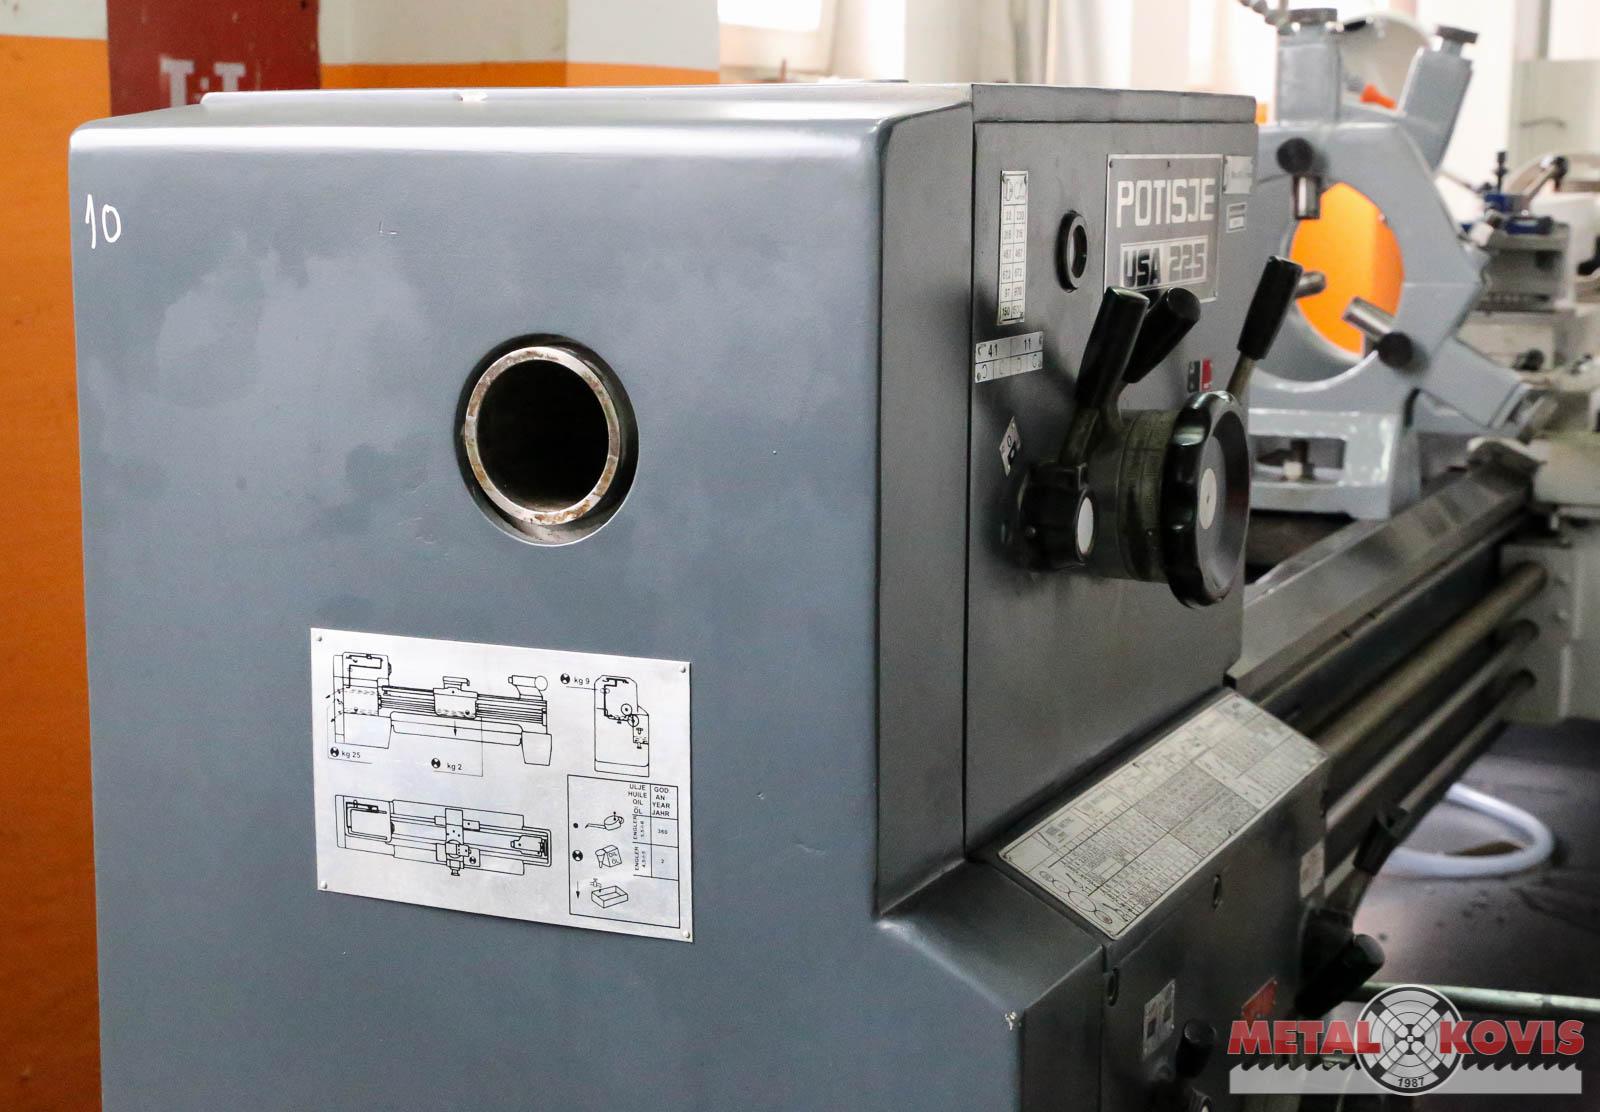 Tokarski stroj Potisje ADA USA 225 × 2000 mm